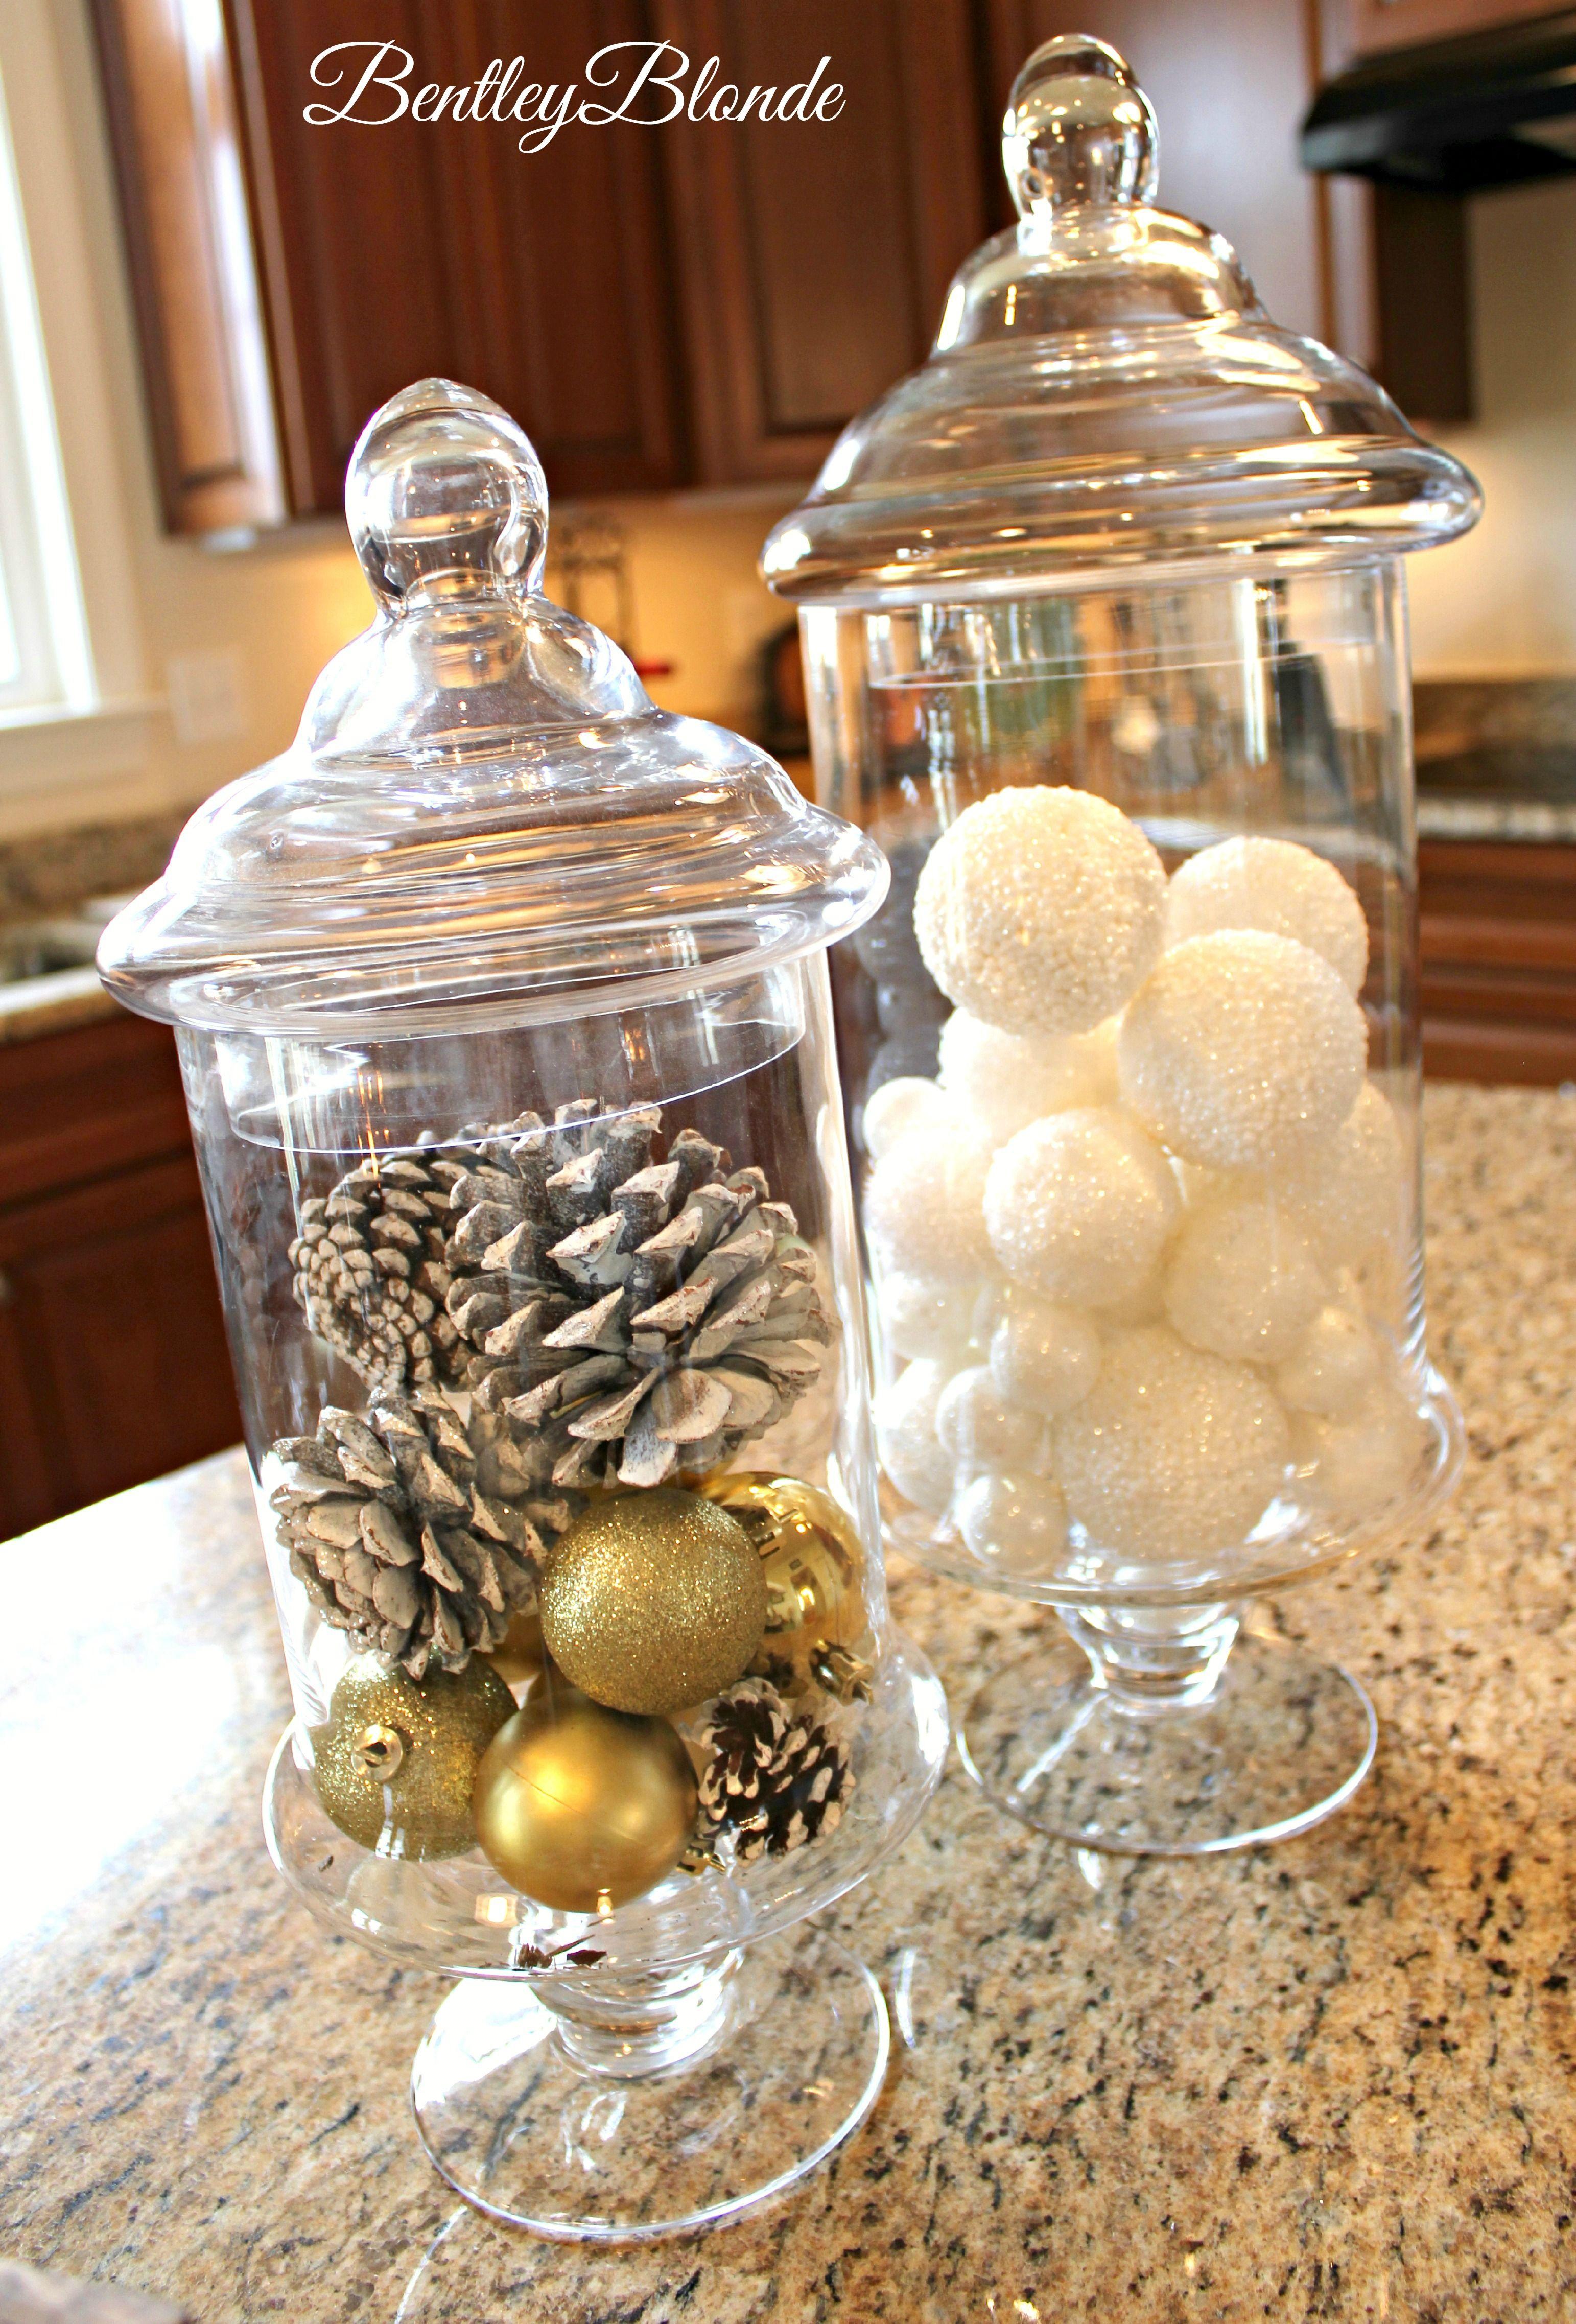 Apothecary Jar Filler For Christmas Bentleyblonde Jar Fillers House Decor Rustic Christmas Jars